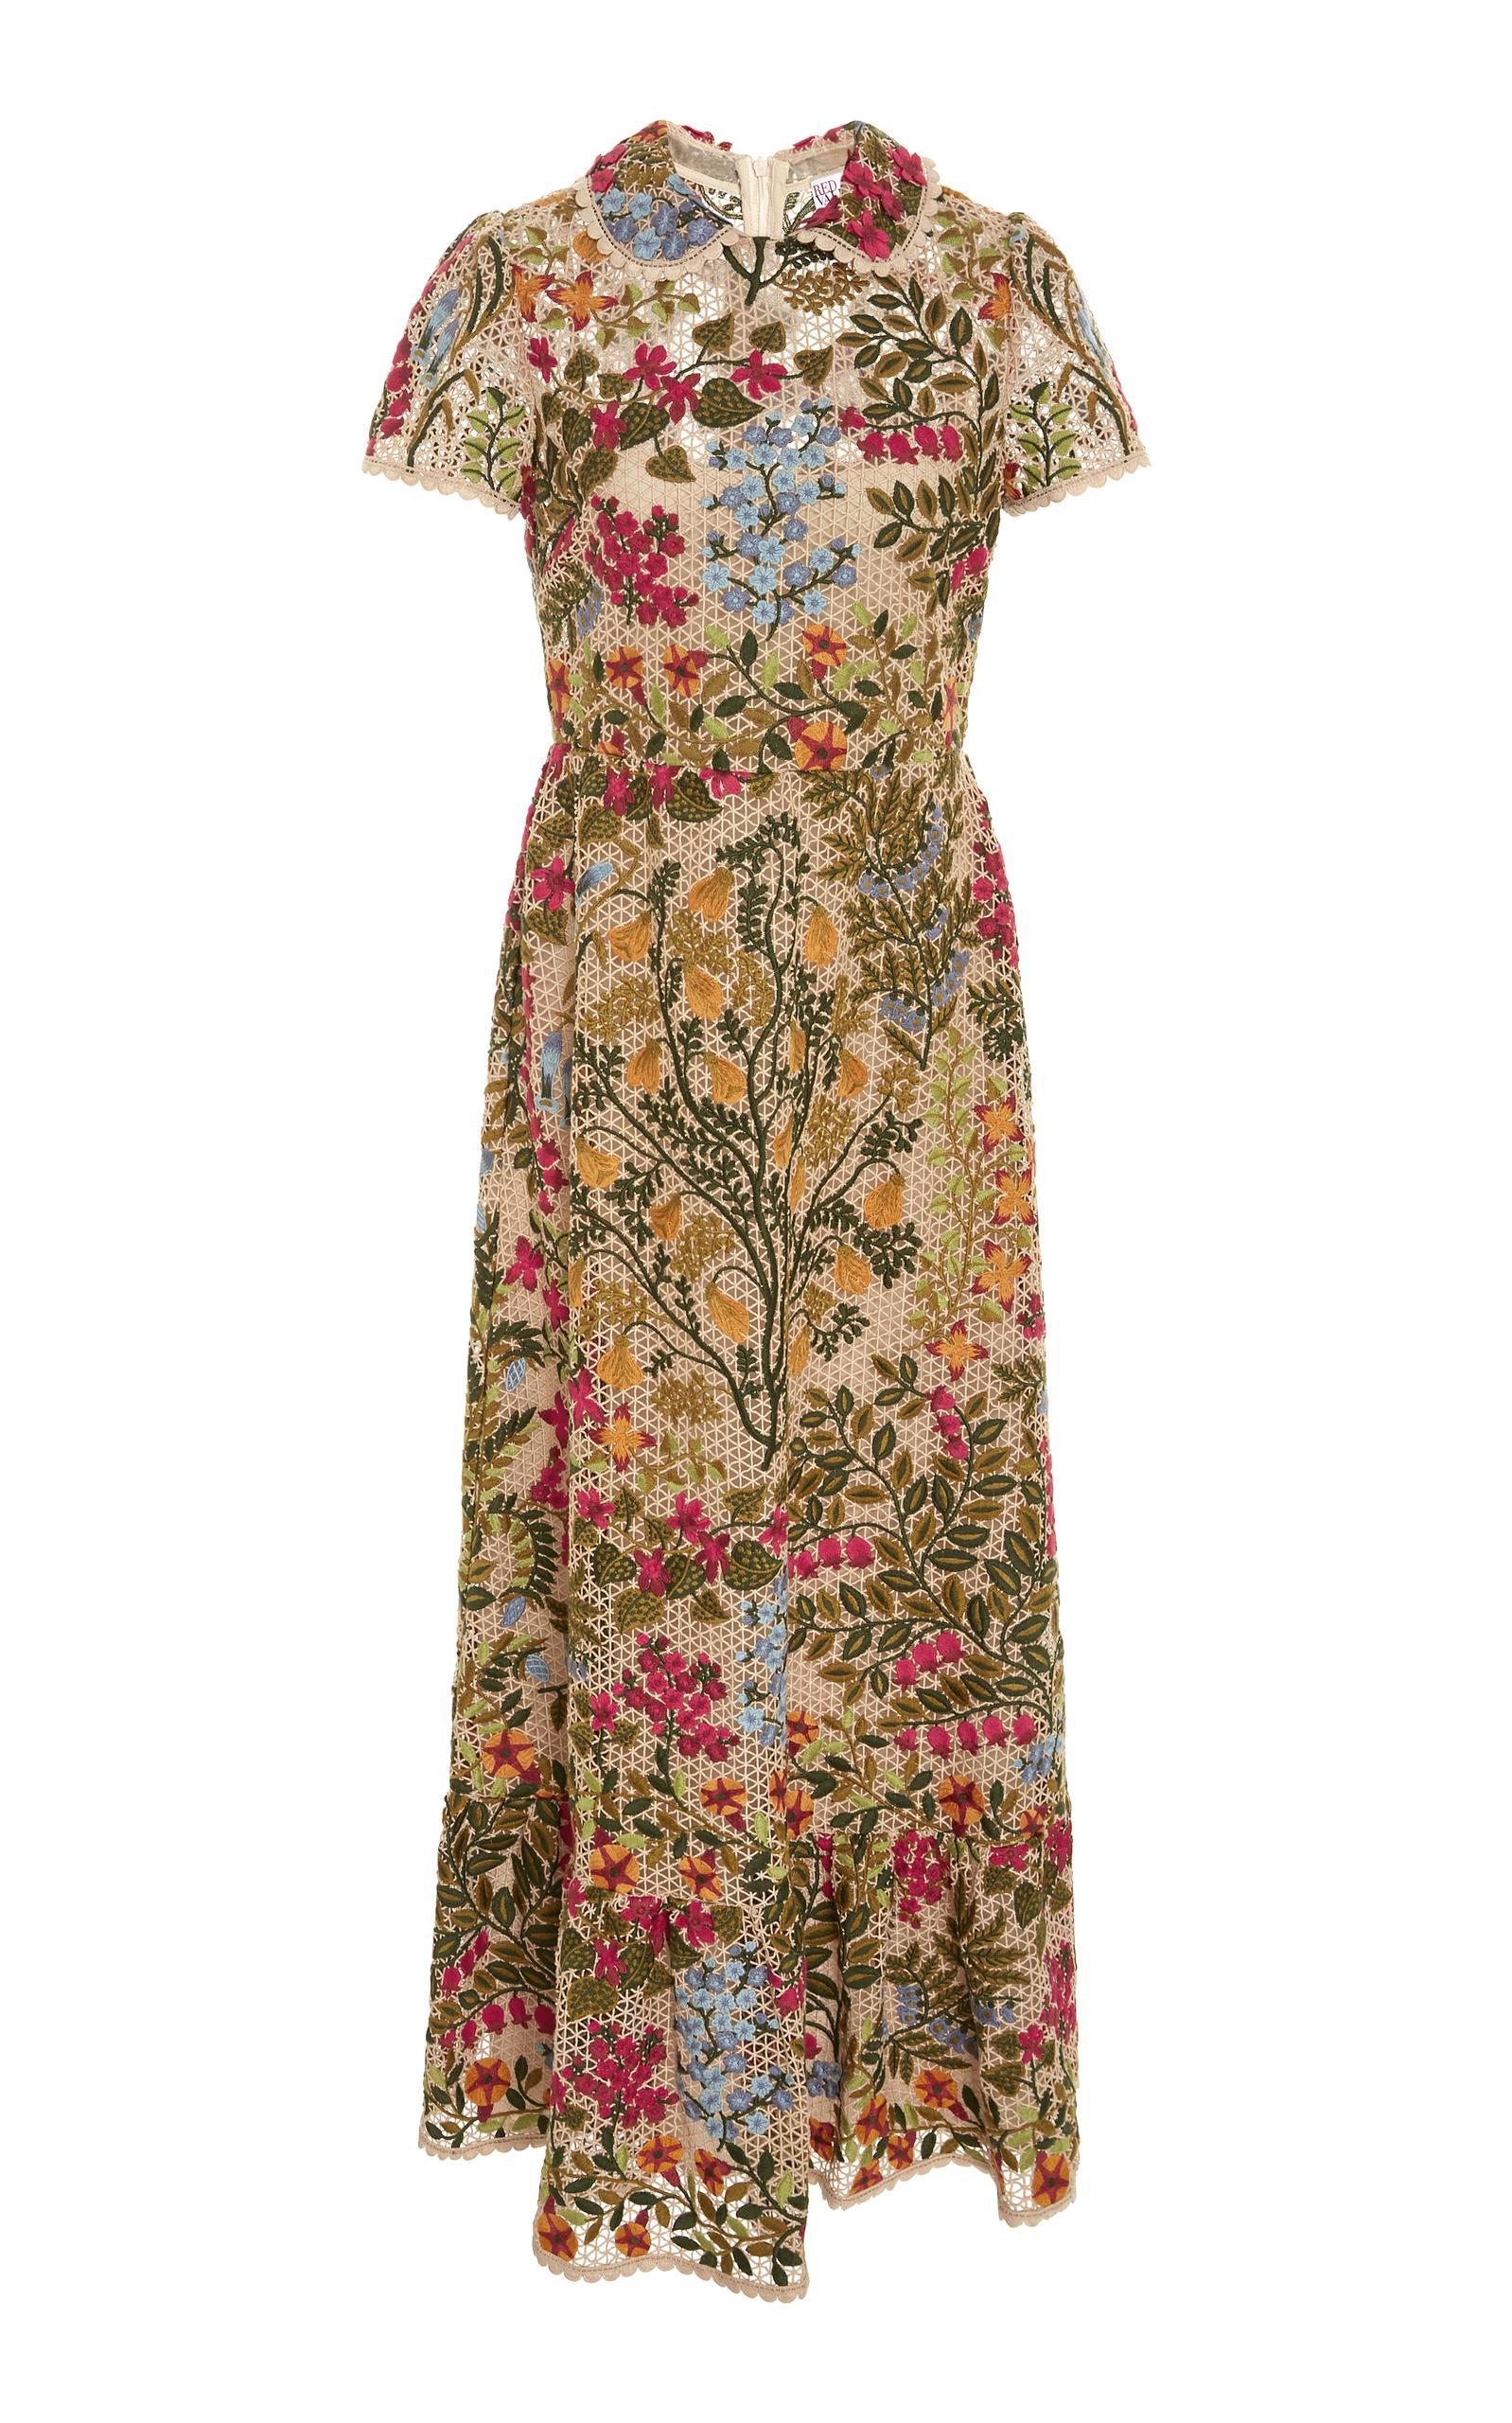 Red Valentino Floral-Embroidered Lace Midi Dress In Multi